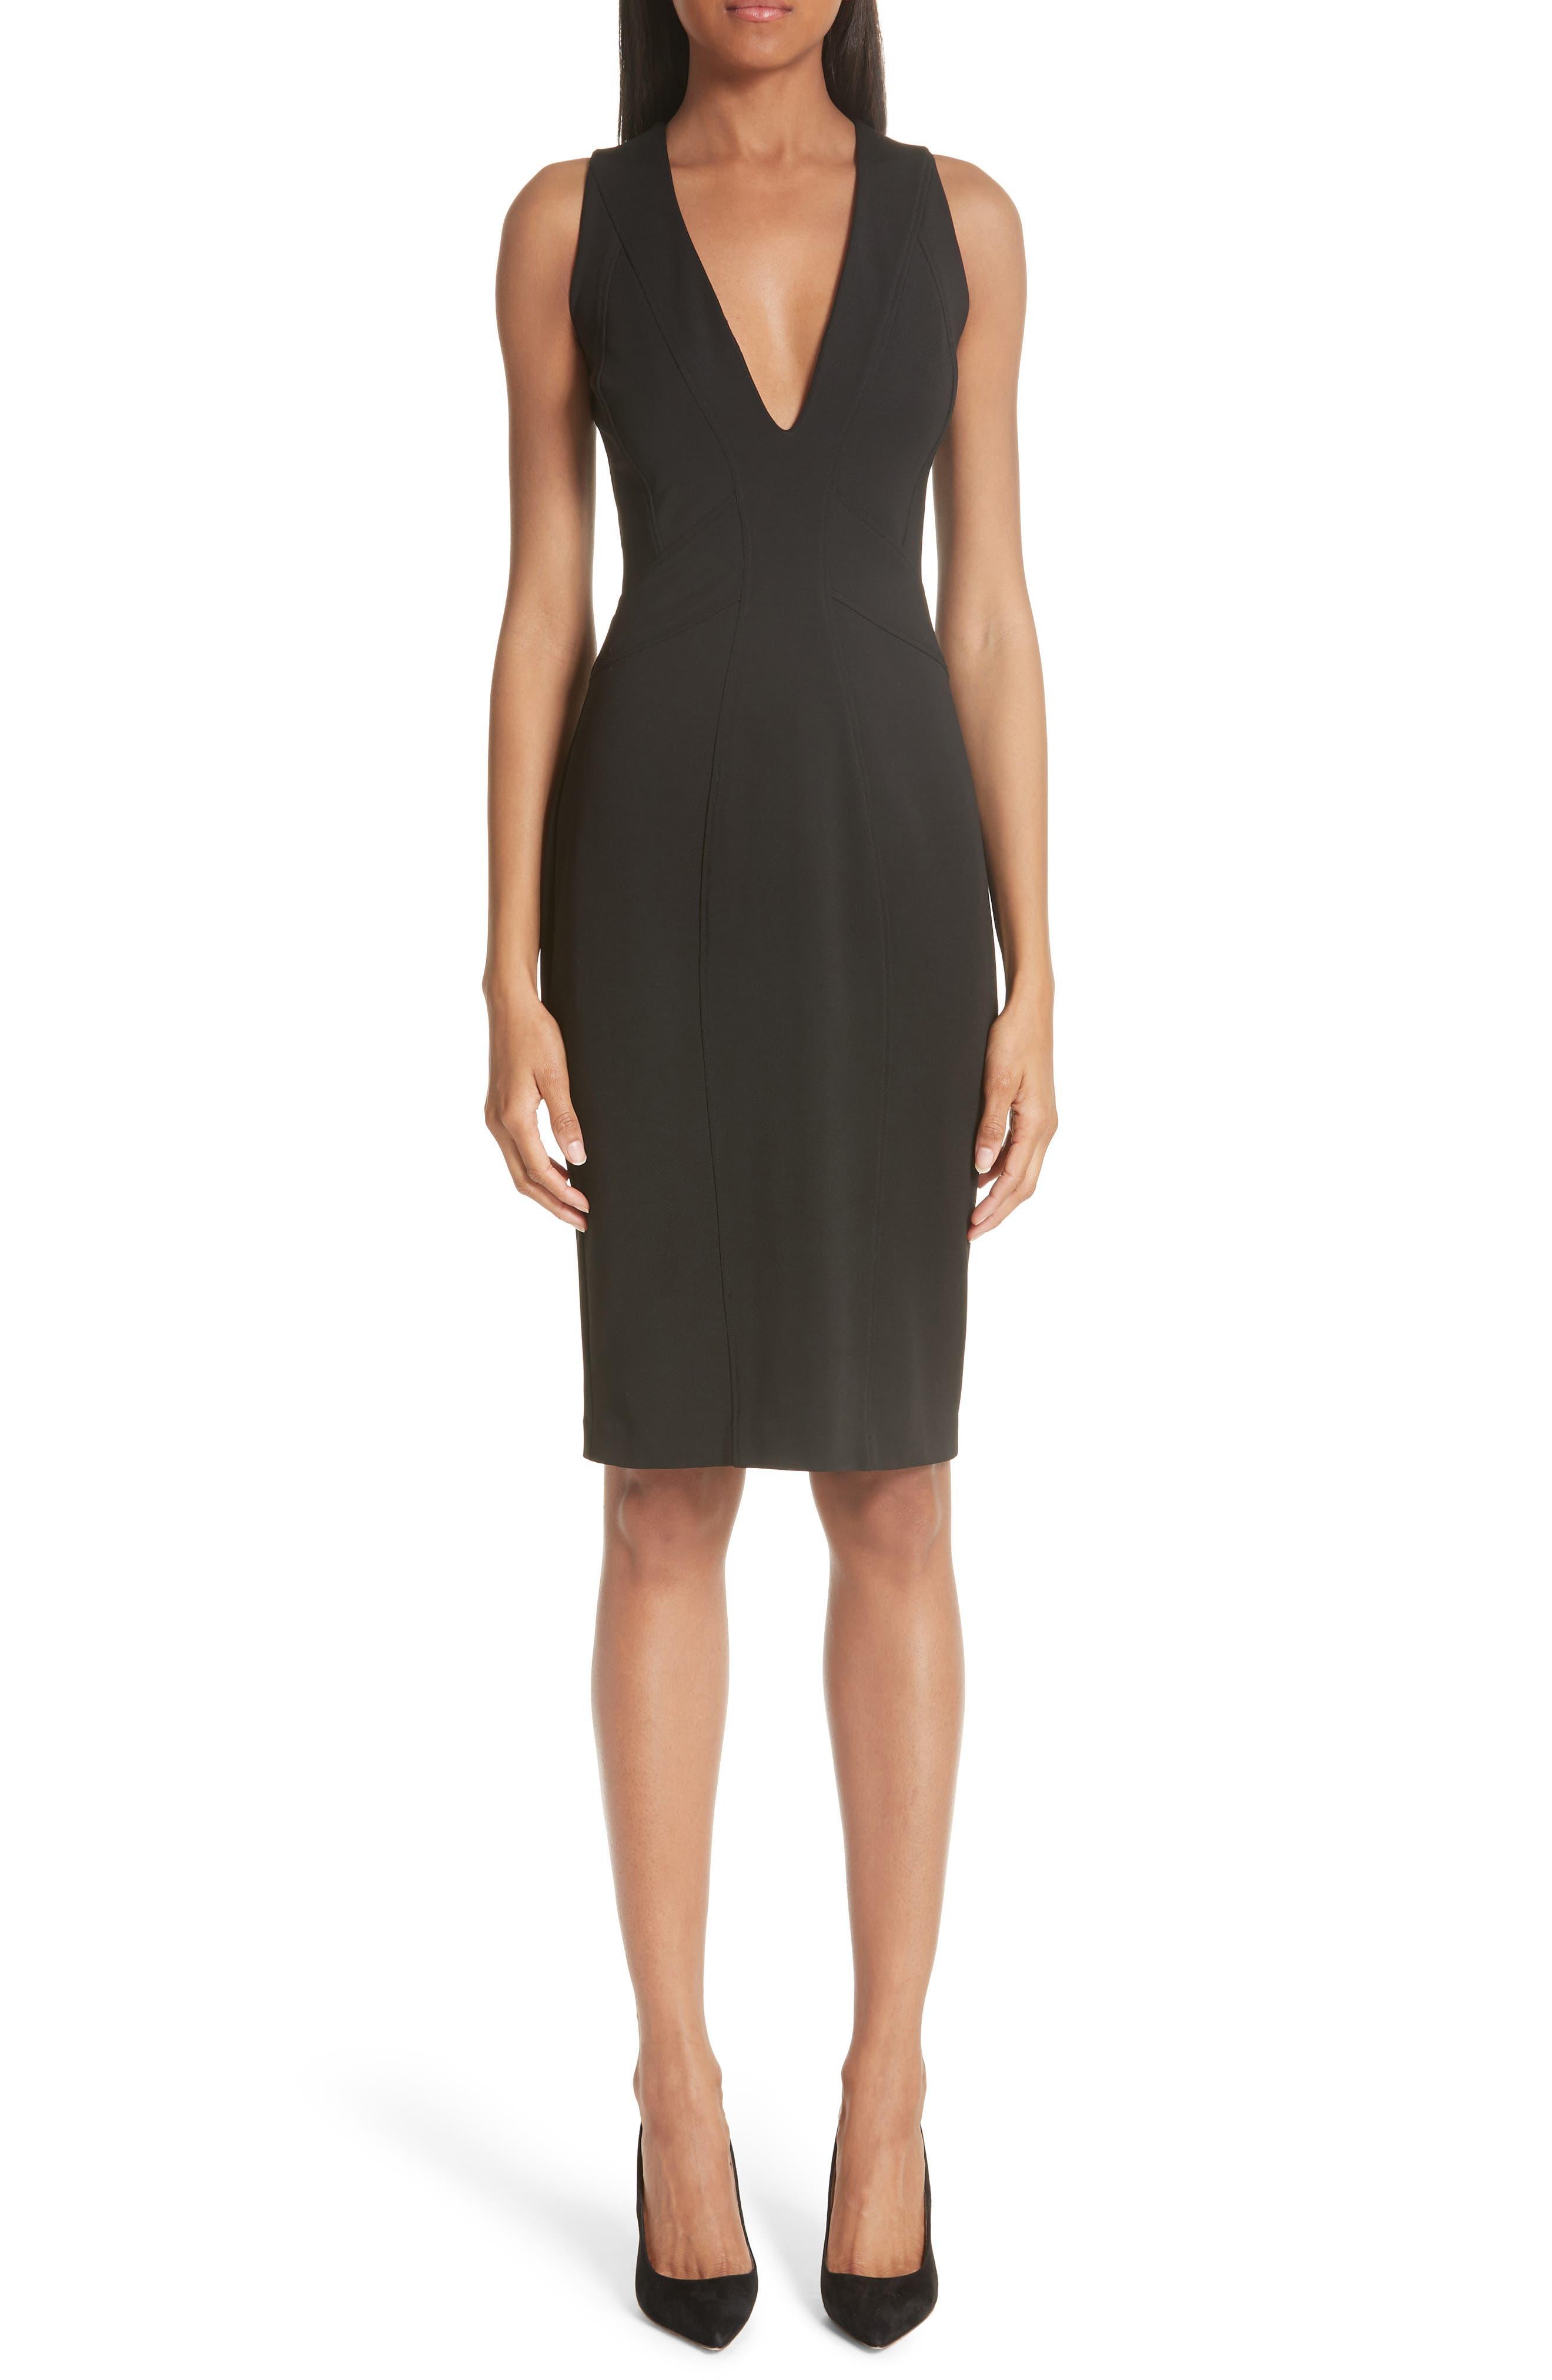 ZAC ZAC POSEN, Sirena Body-Con Dress, Main thumbnail 1, color, BLACK